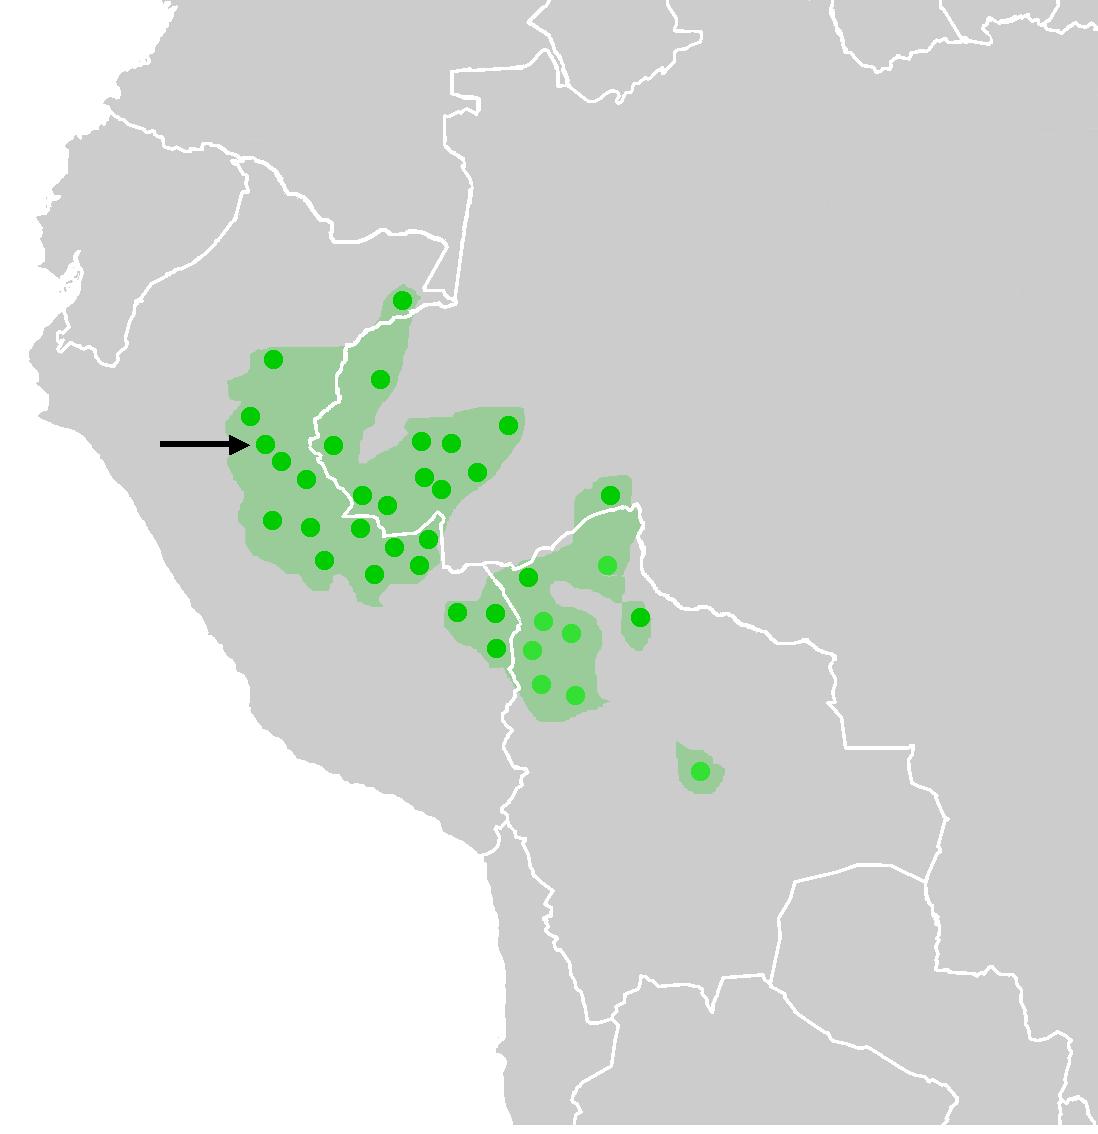 Resultado de imagen para Ashaninka casa mapa